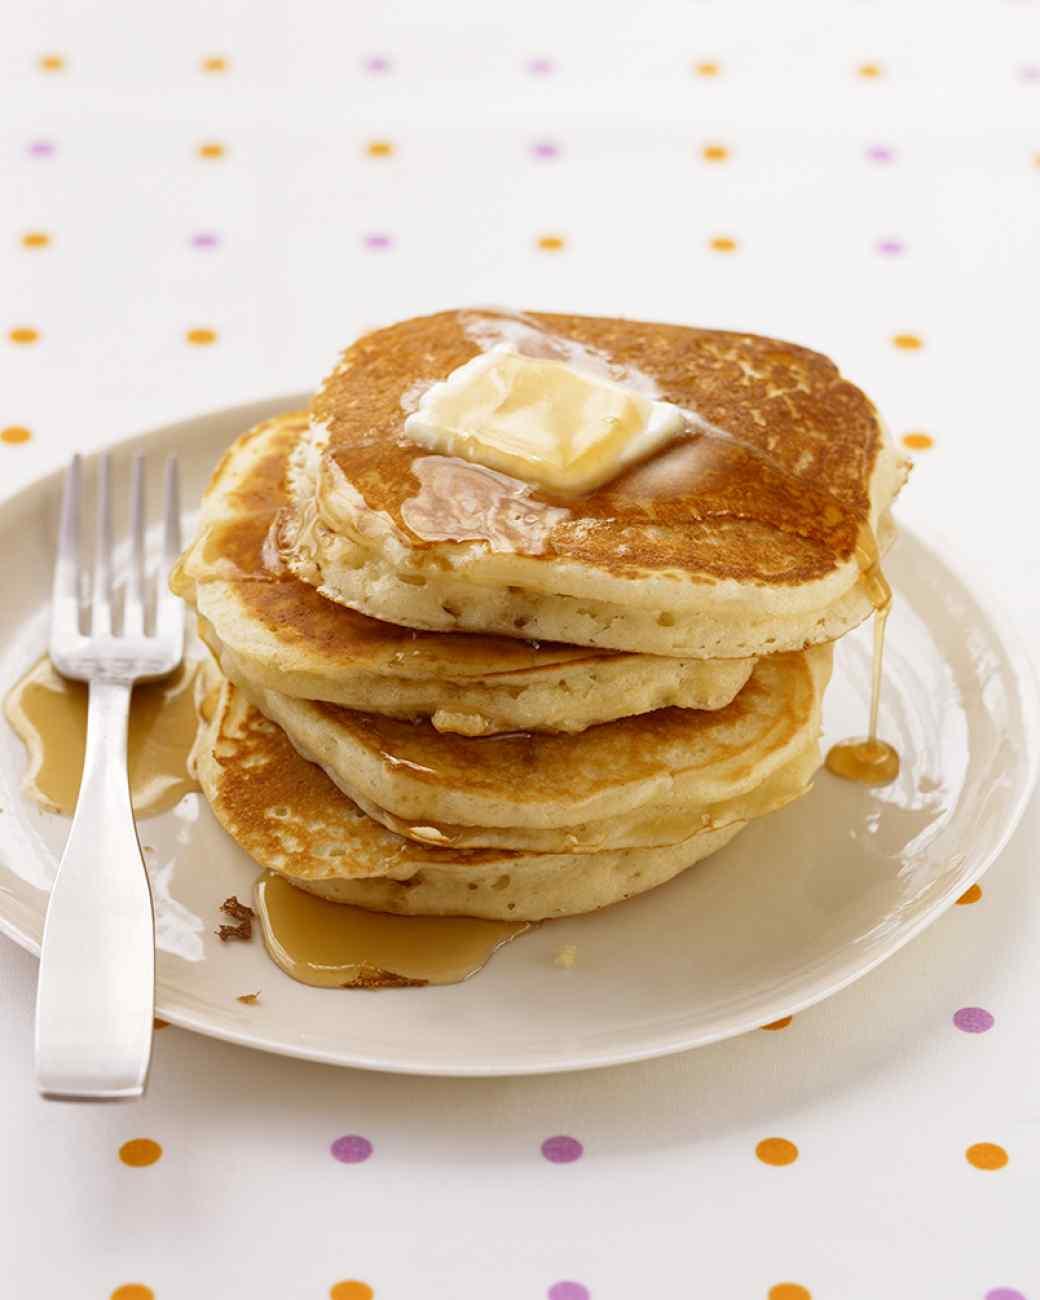 ed102283_0906_pancakes_vert.jpg